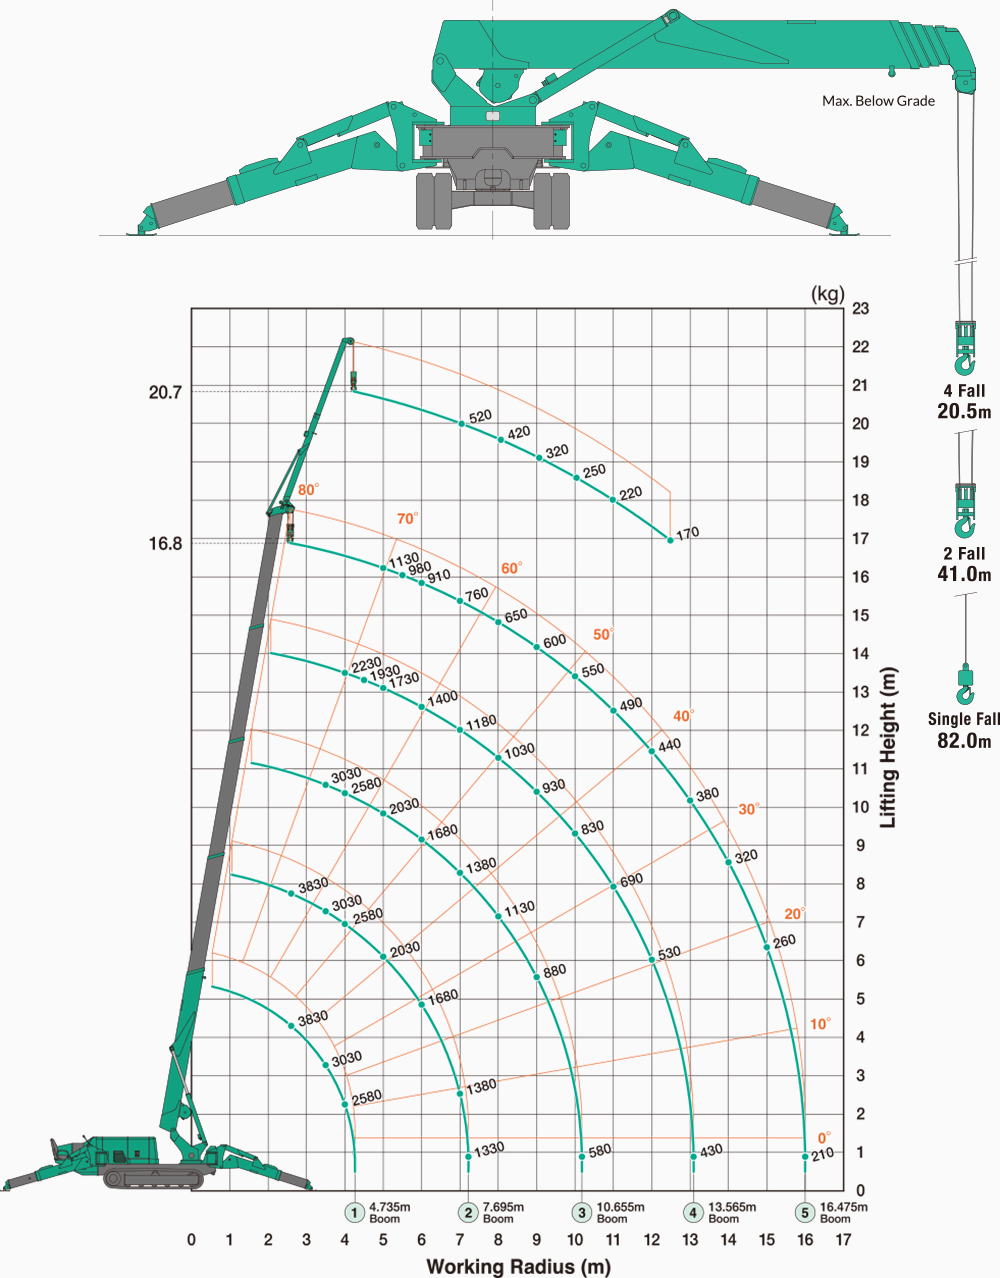 Maeda MC405 Outriggers Position : Max